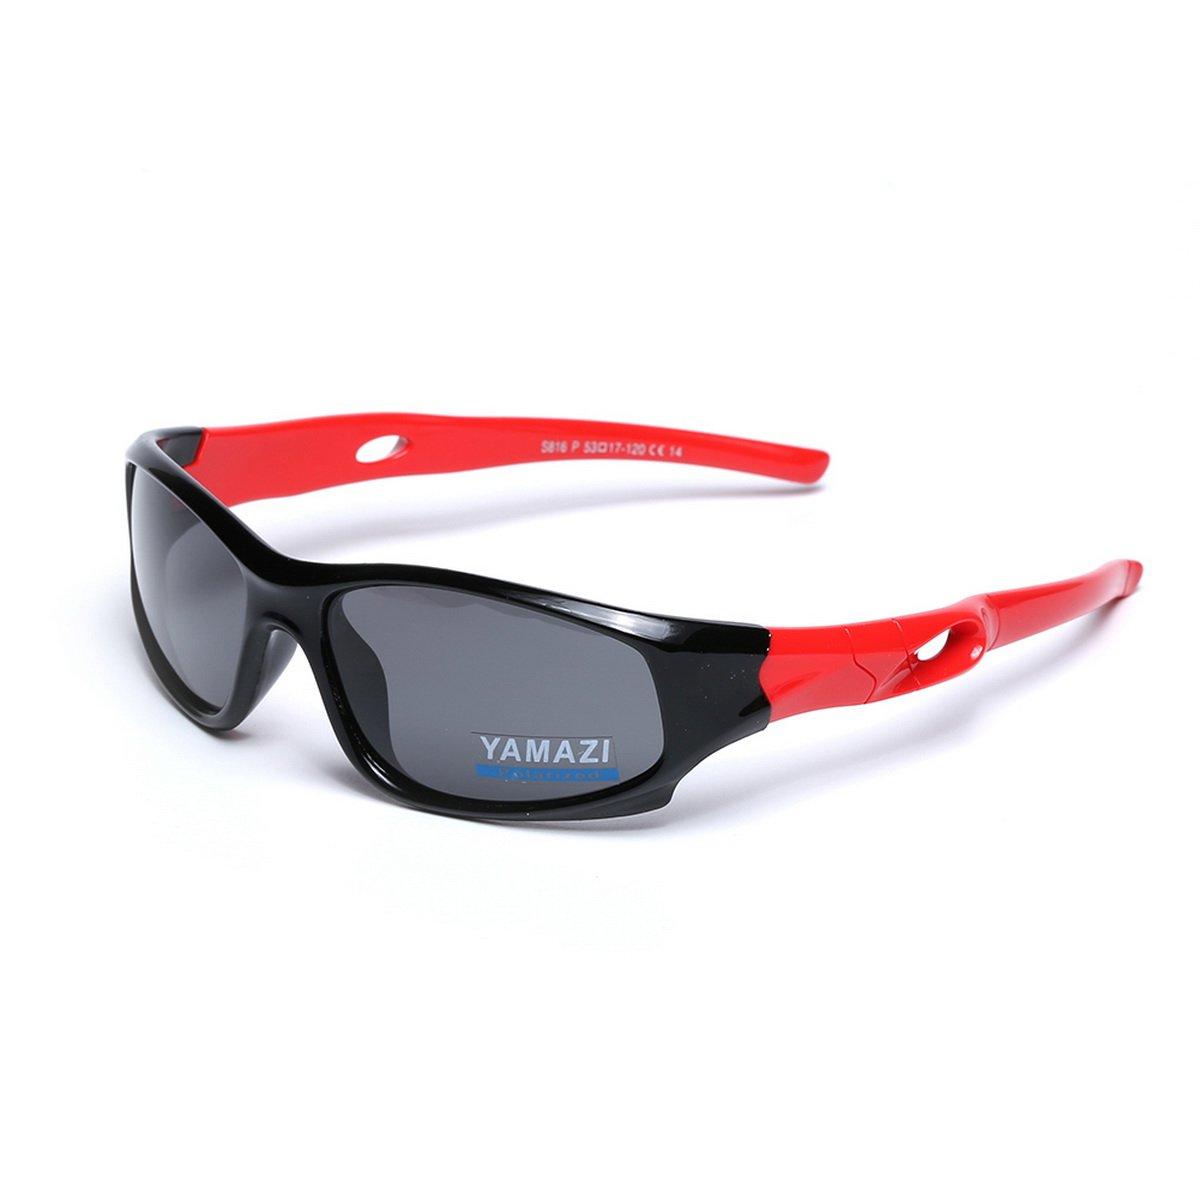 cd5e196aec Get Quotations · YAMAZI Children Sports Polarized Sunglasses For Kids Boys  Girls Rubber Flexible Frame Sunglasses UV Protection